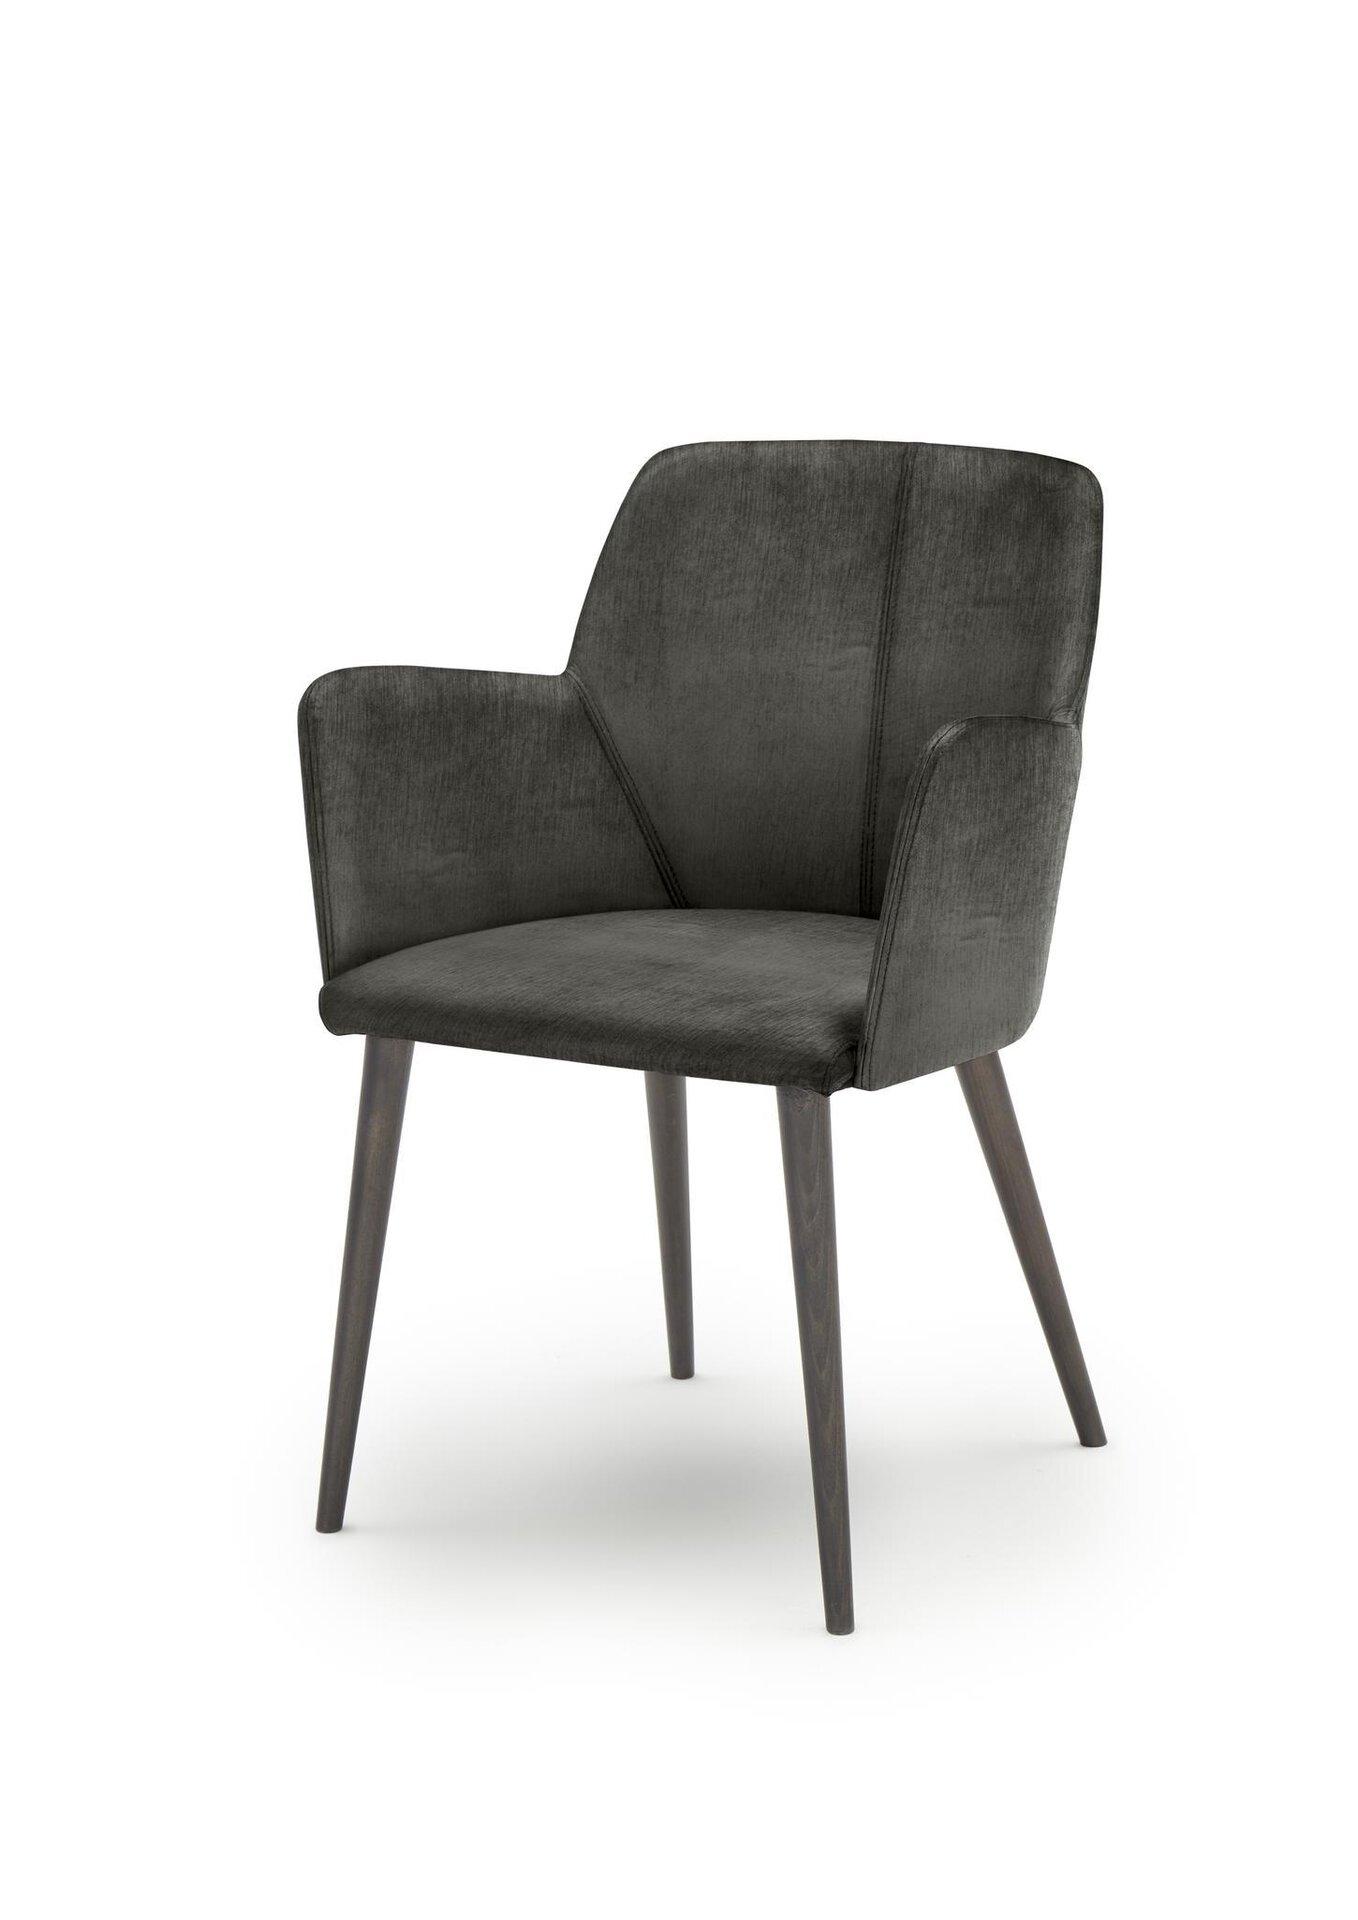 4-Fuß-Stuhl WK7005 Stuart WK Wohnen Edition Textil 57 x 83 x 59 cm